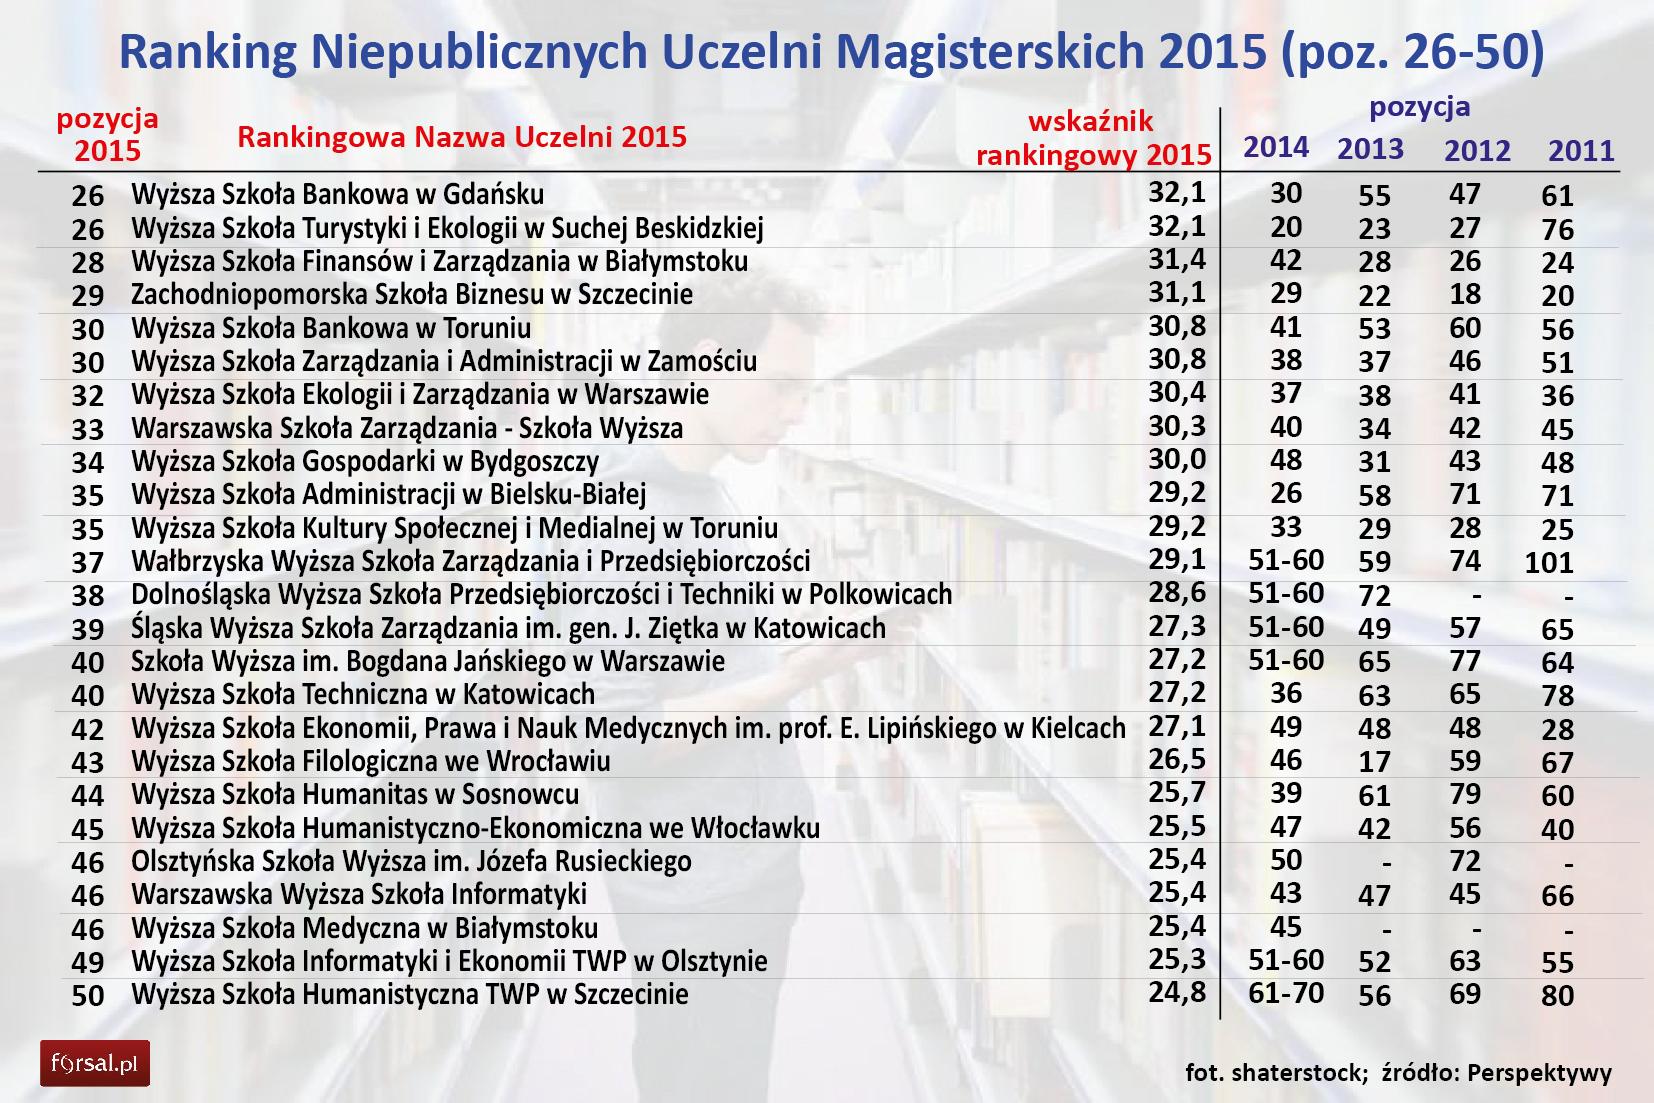 Ranking Perspektyw 2015